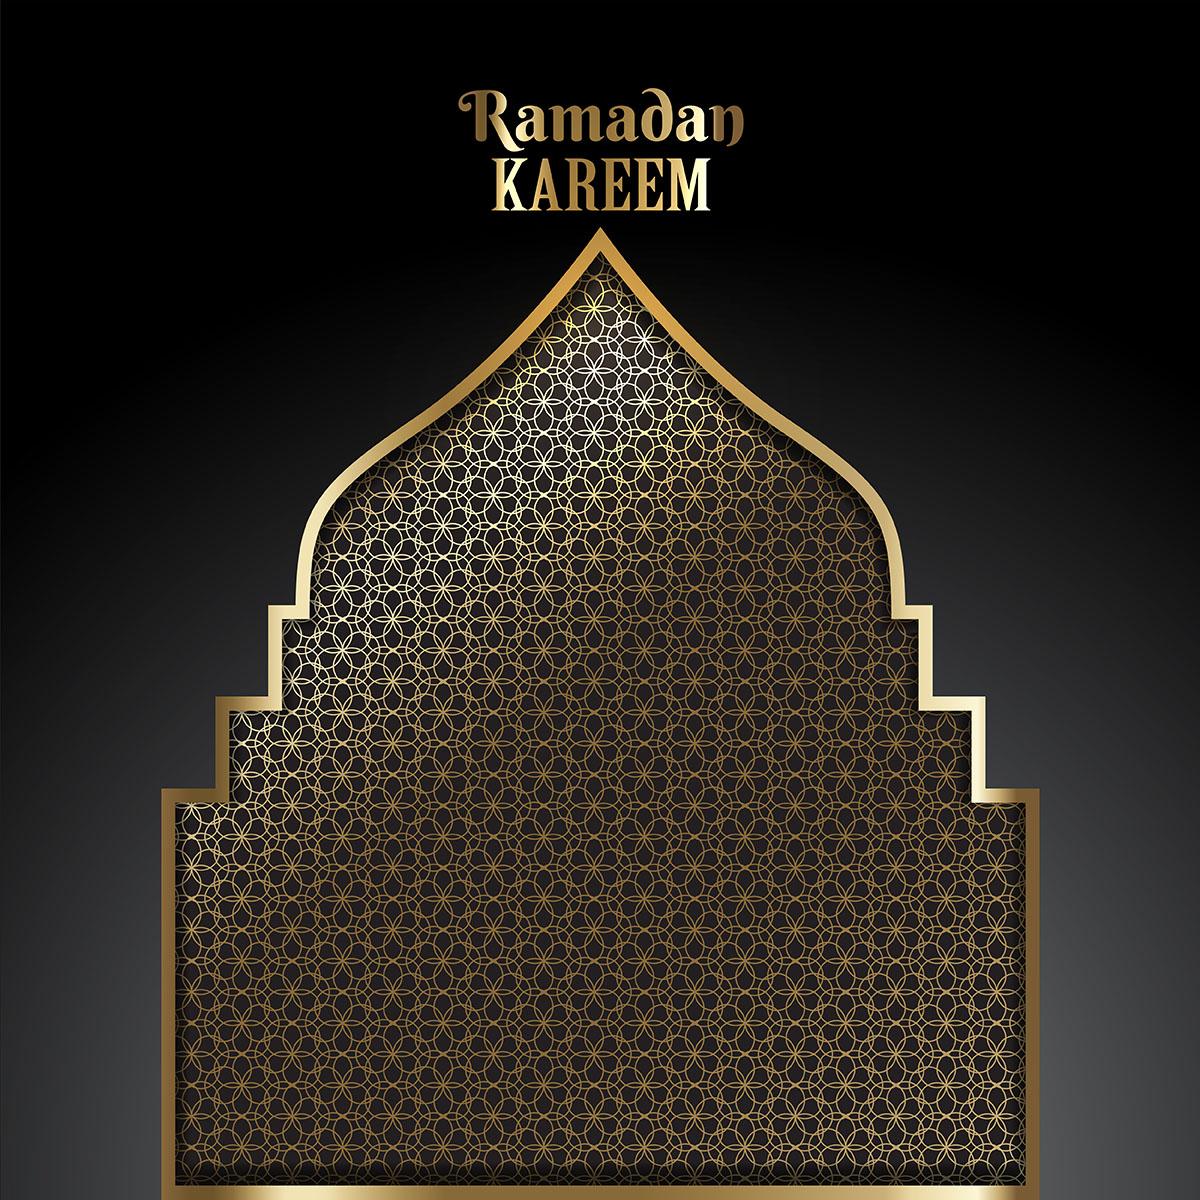 Decorative Ramadan background - Download Free Vector Art